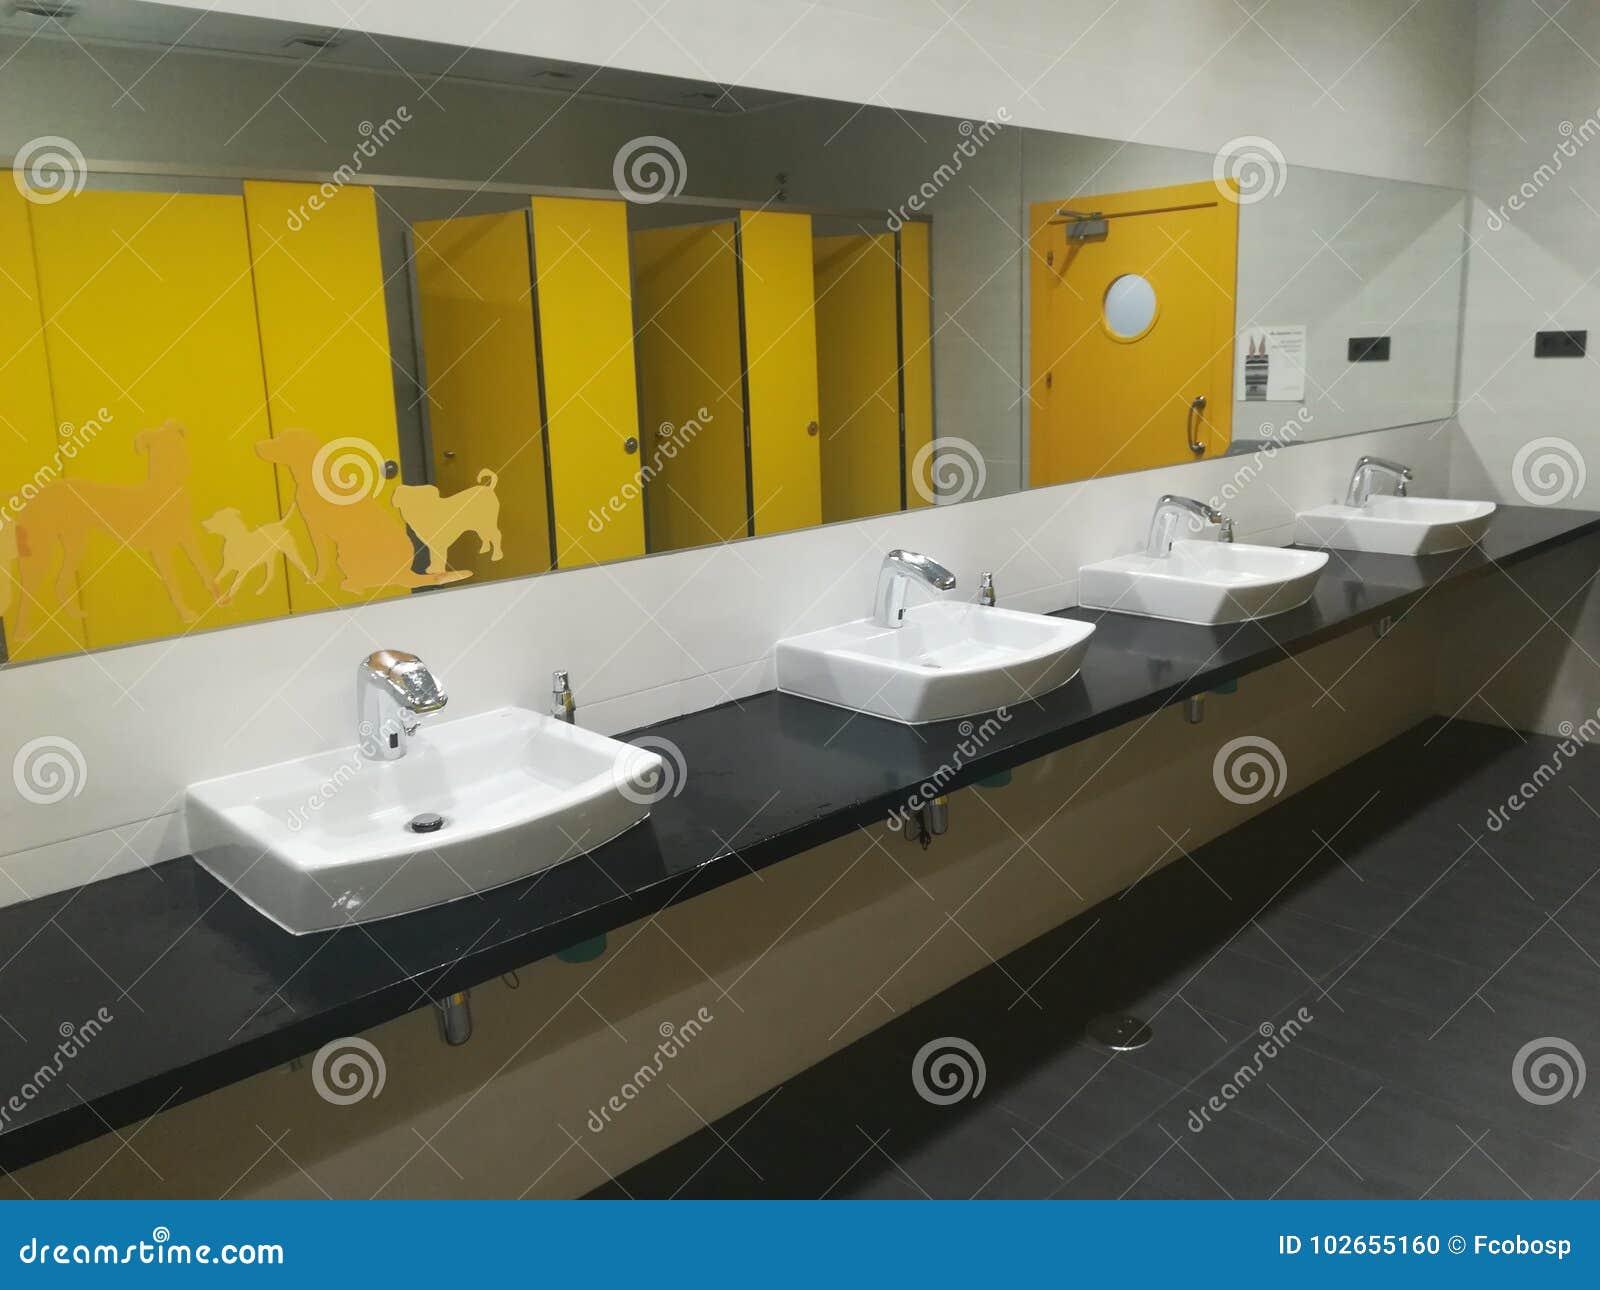 Modern Wc toilet stock photo. Image of restroom, bathroom - 102655160